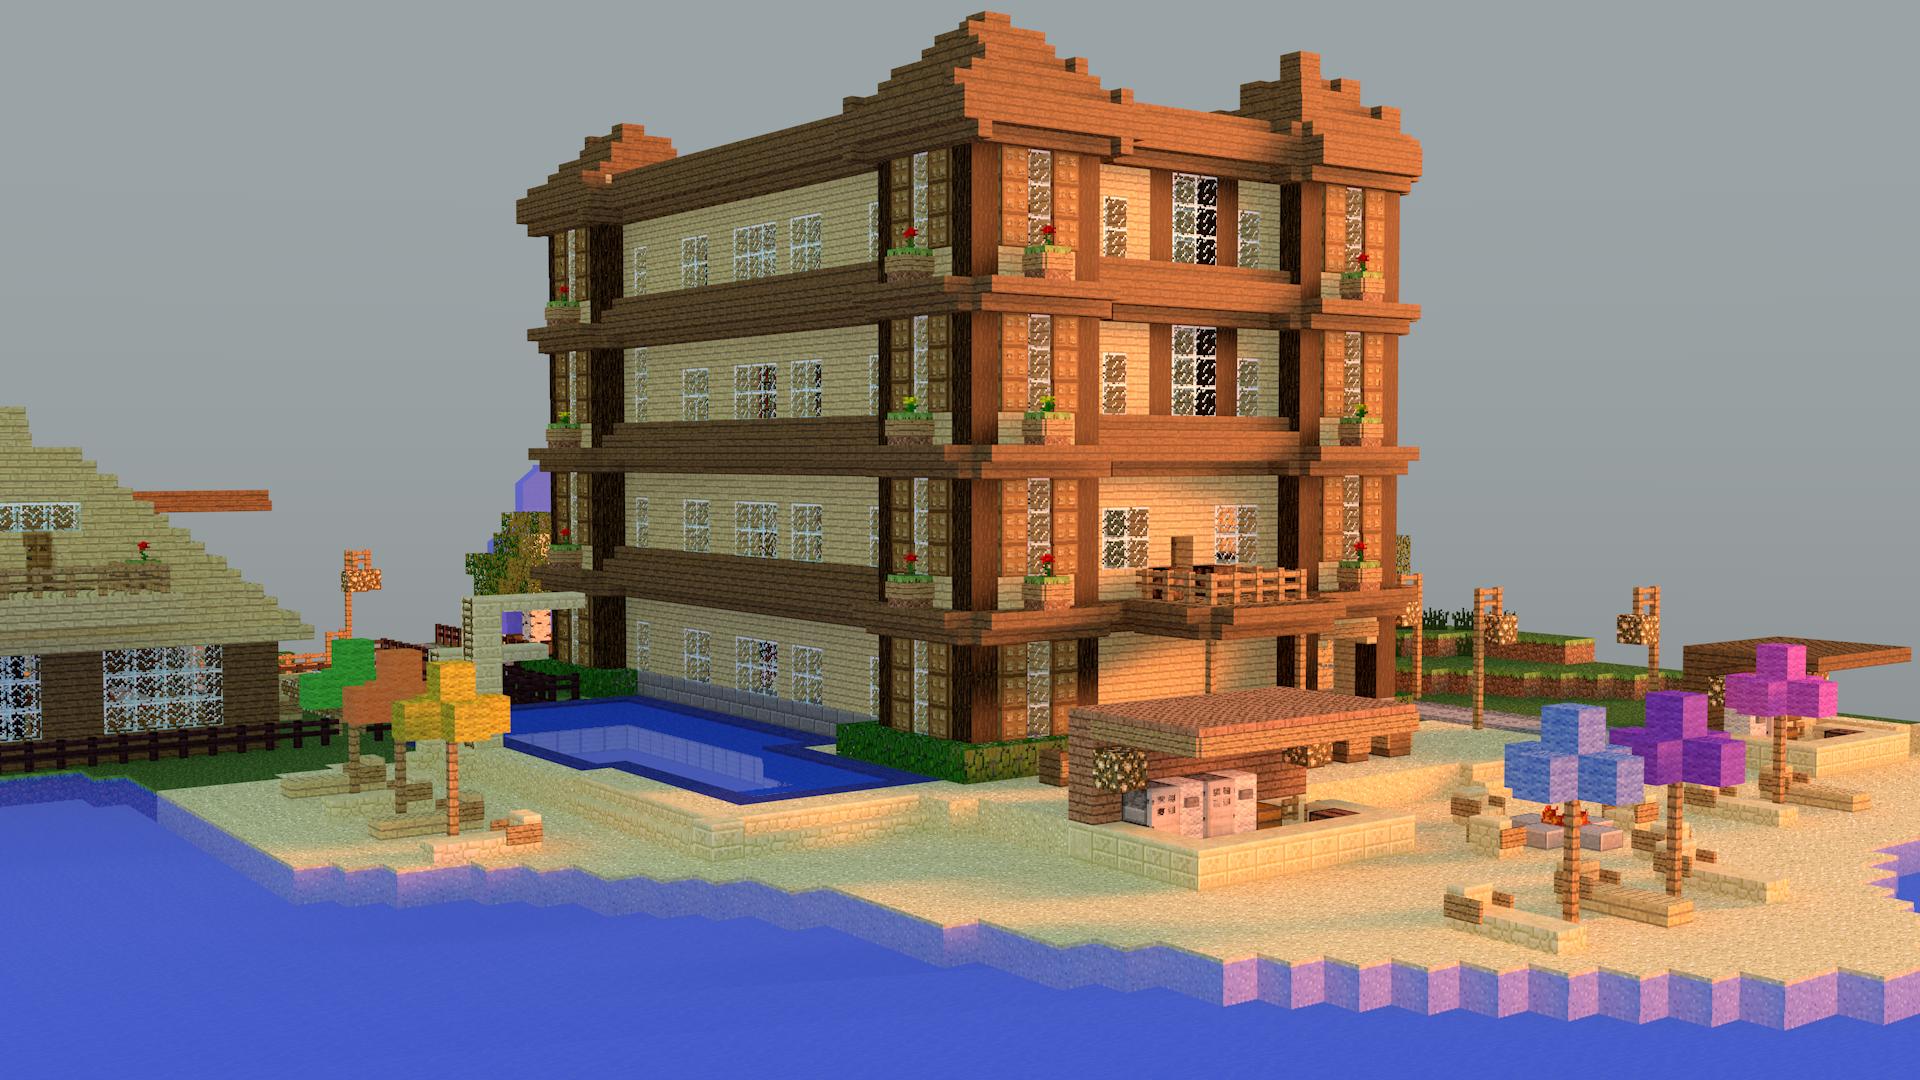 Minecraft Beach Hotel by TheJustMine